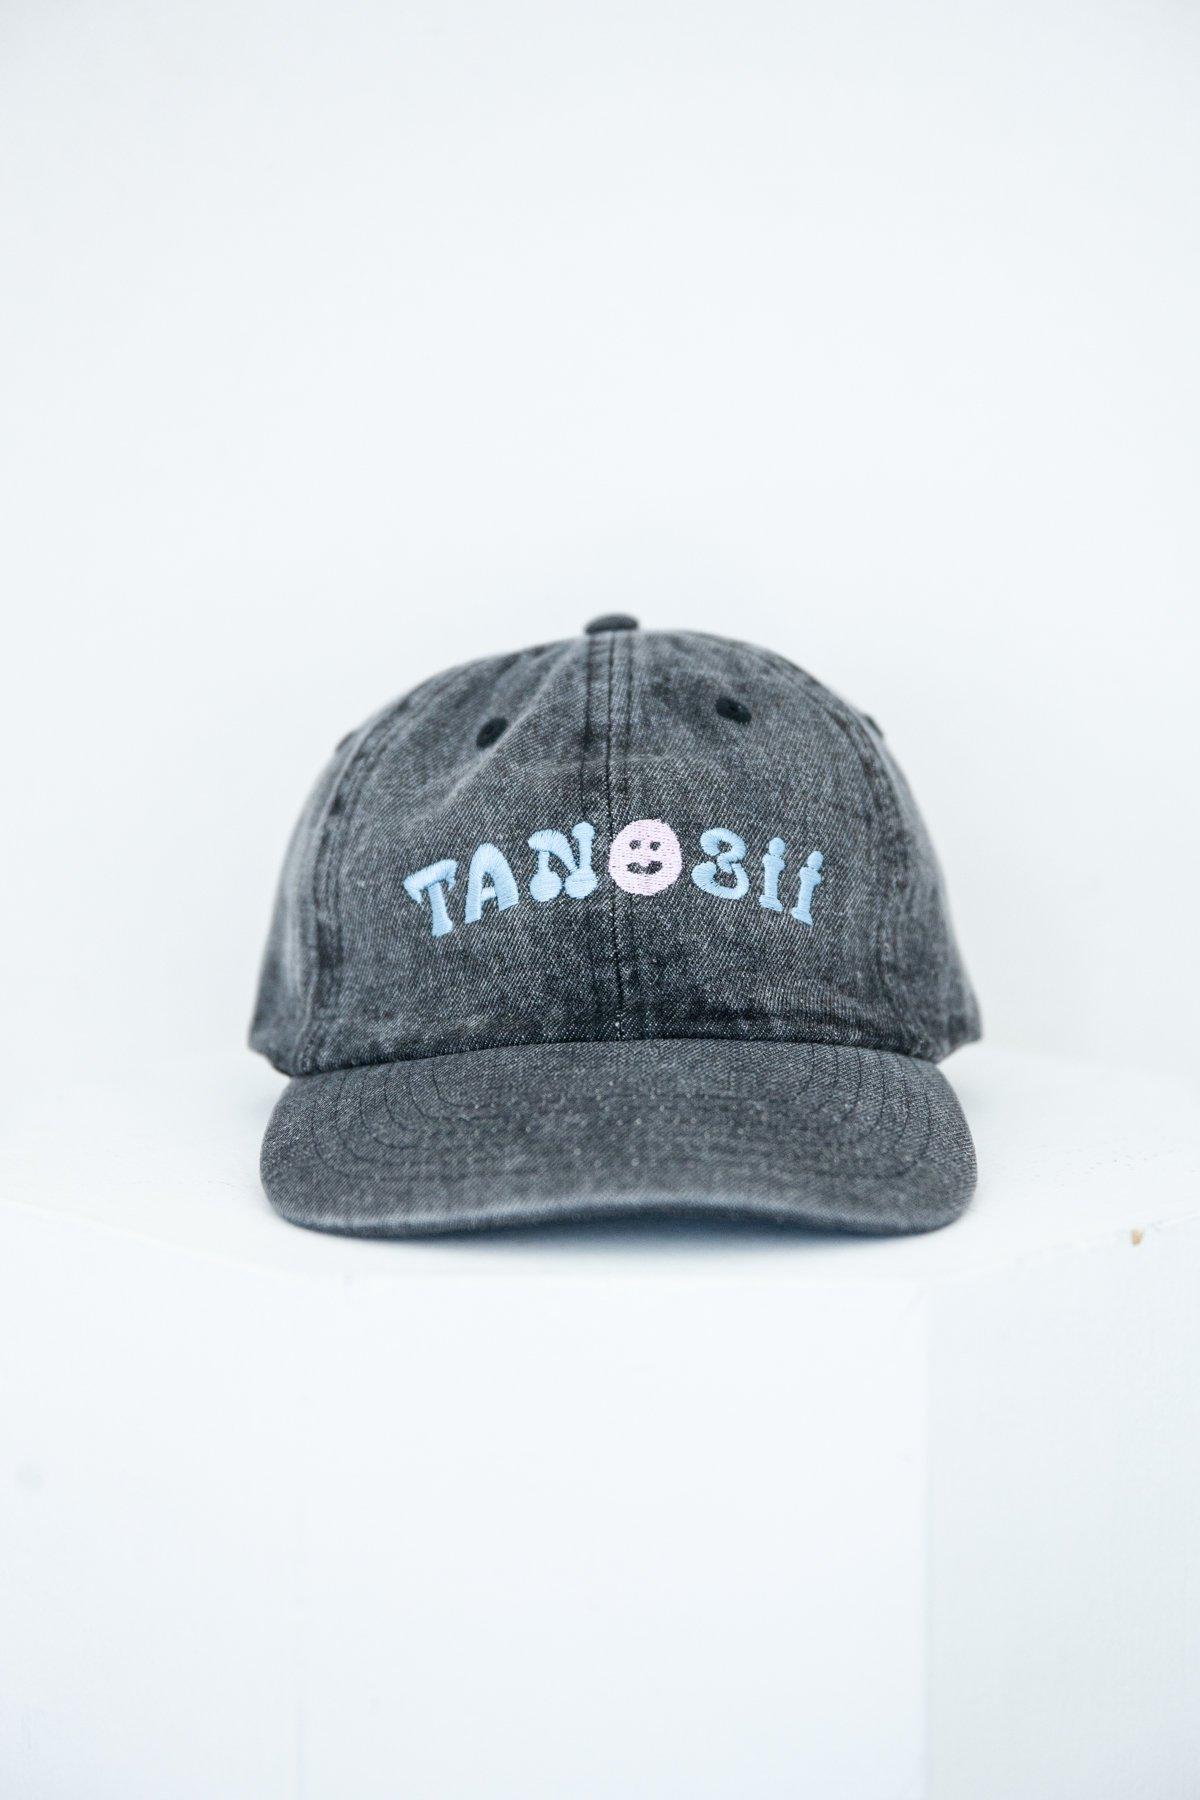 BOKU MO TANOSII × TOYAMEG / CAP BLACK